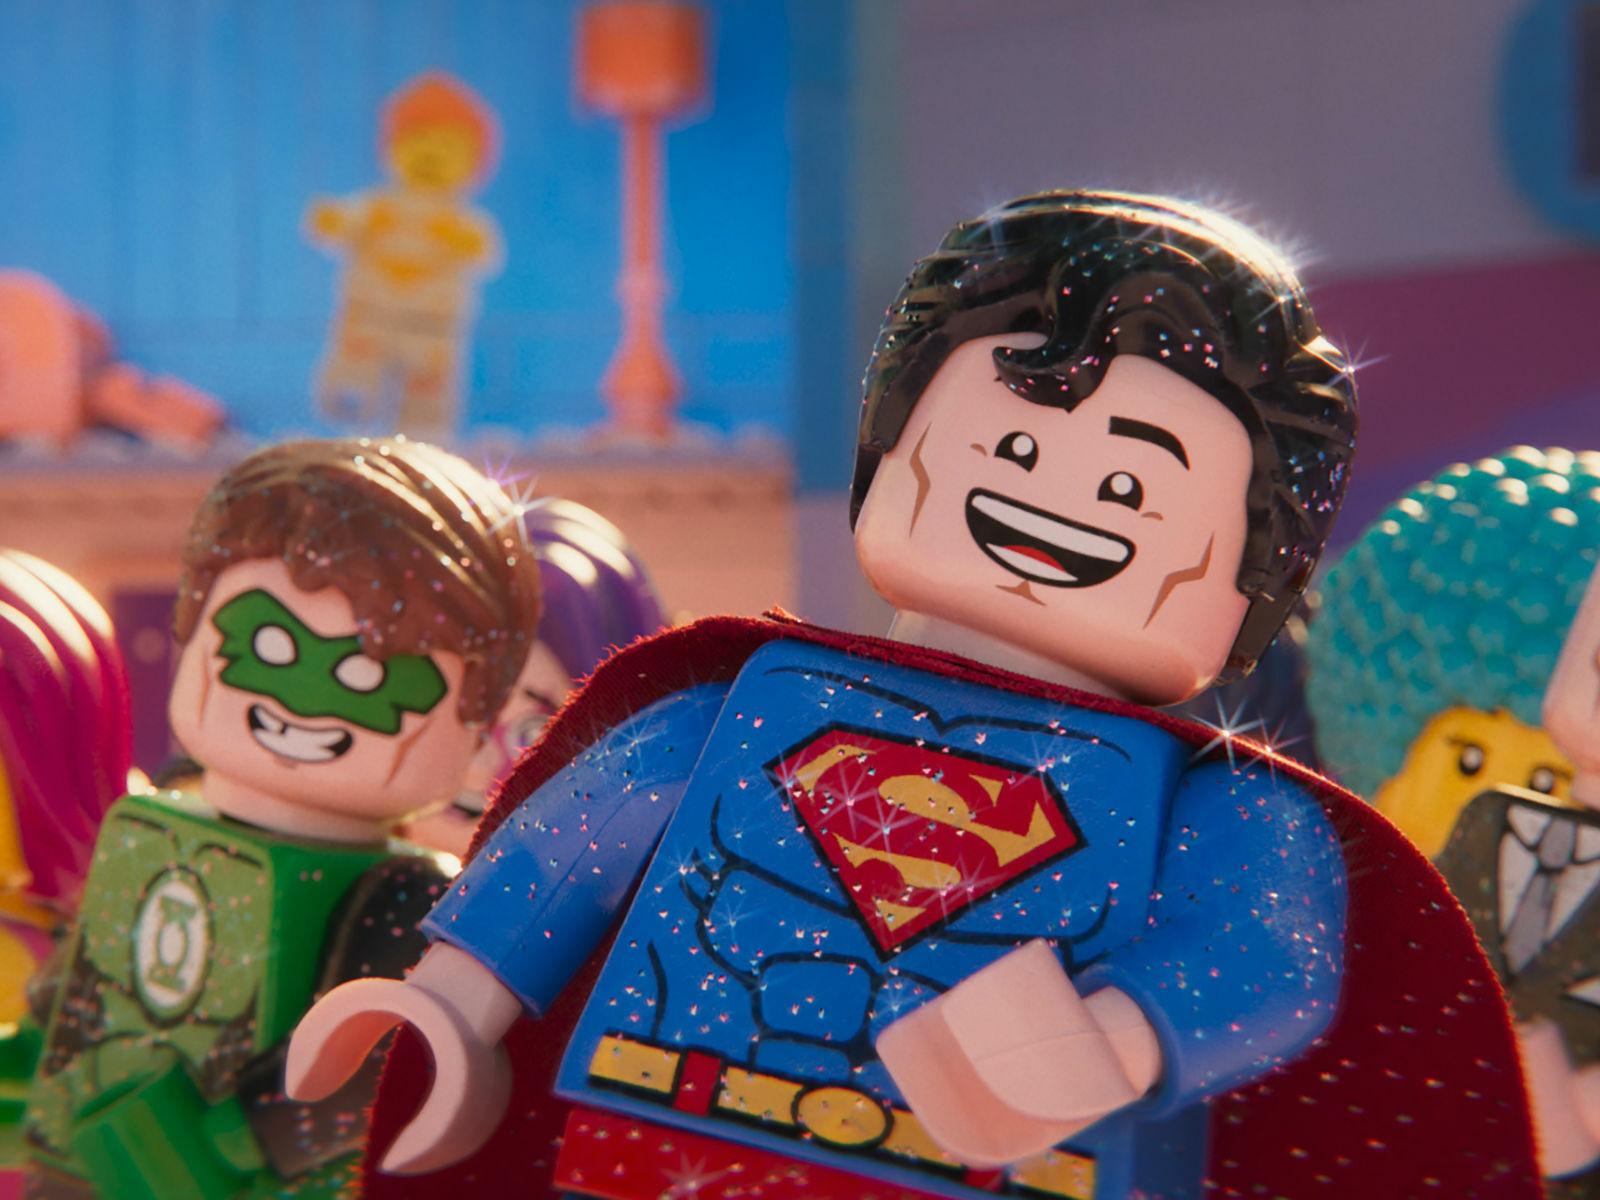 La gran aventura: Lego 2, la segunda entrega de Lego